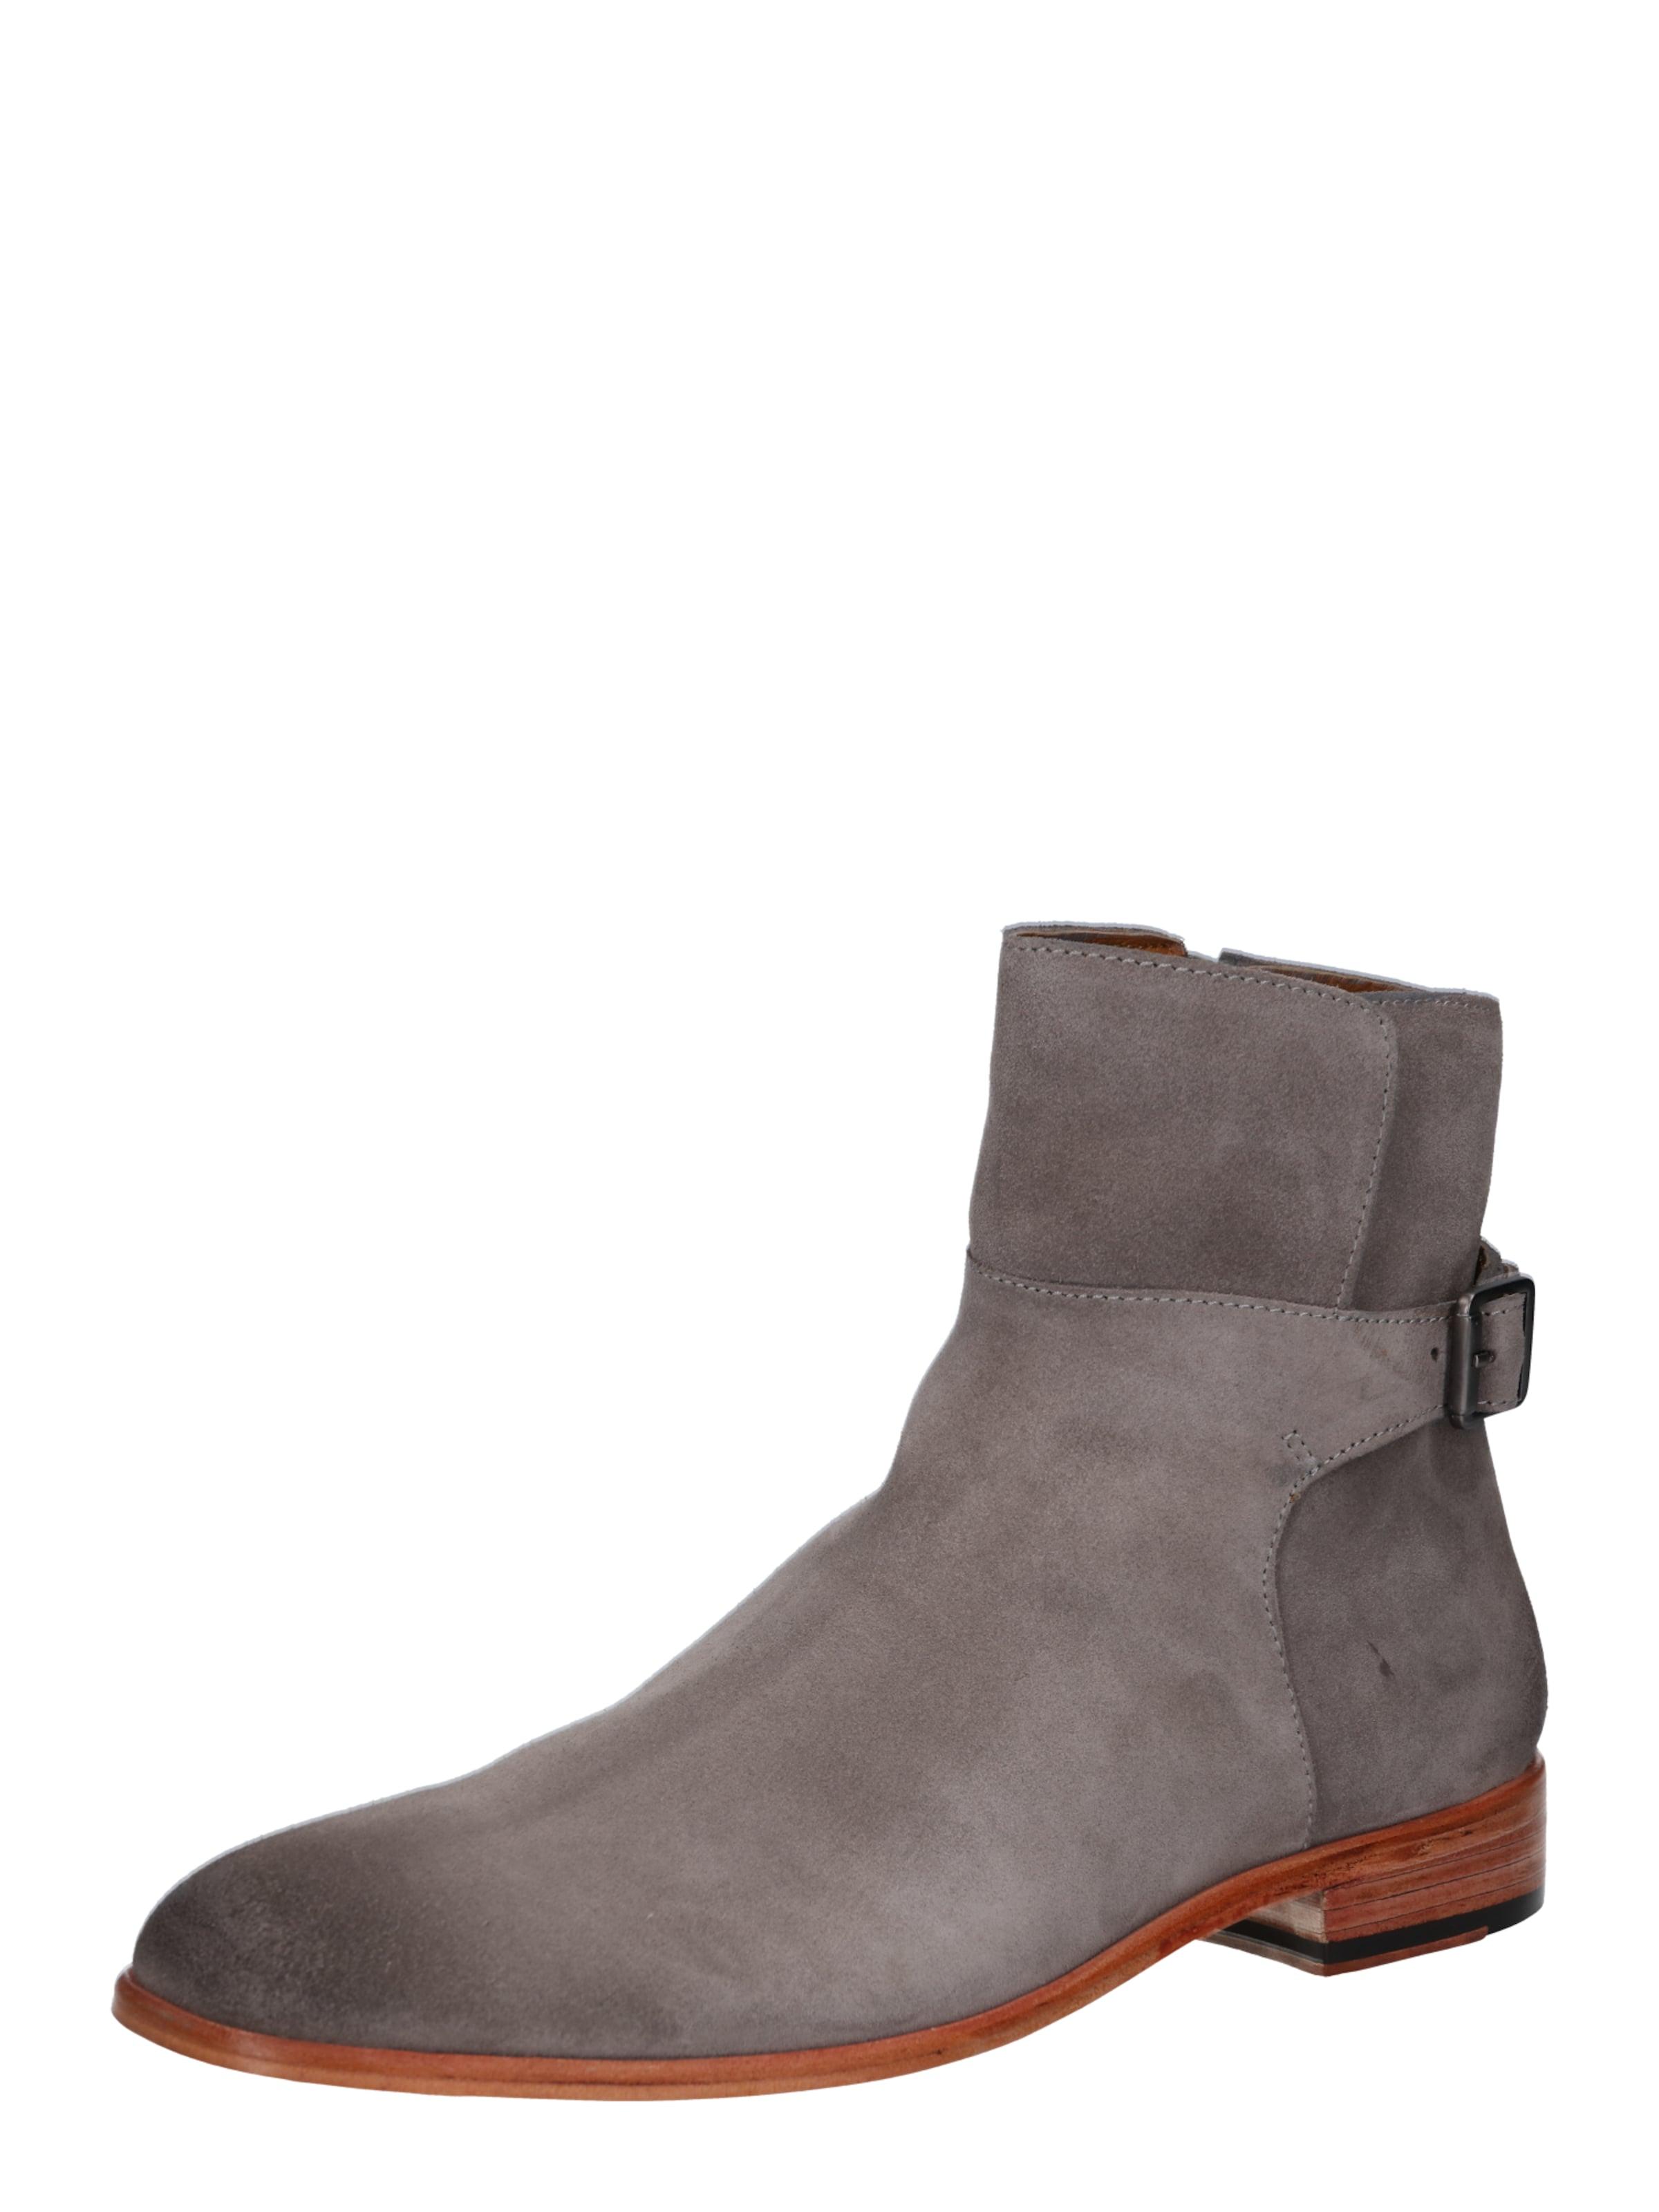 01' En Chelsea Tigha Taupe Boots 'nestor rQxtsdhC